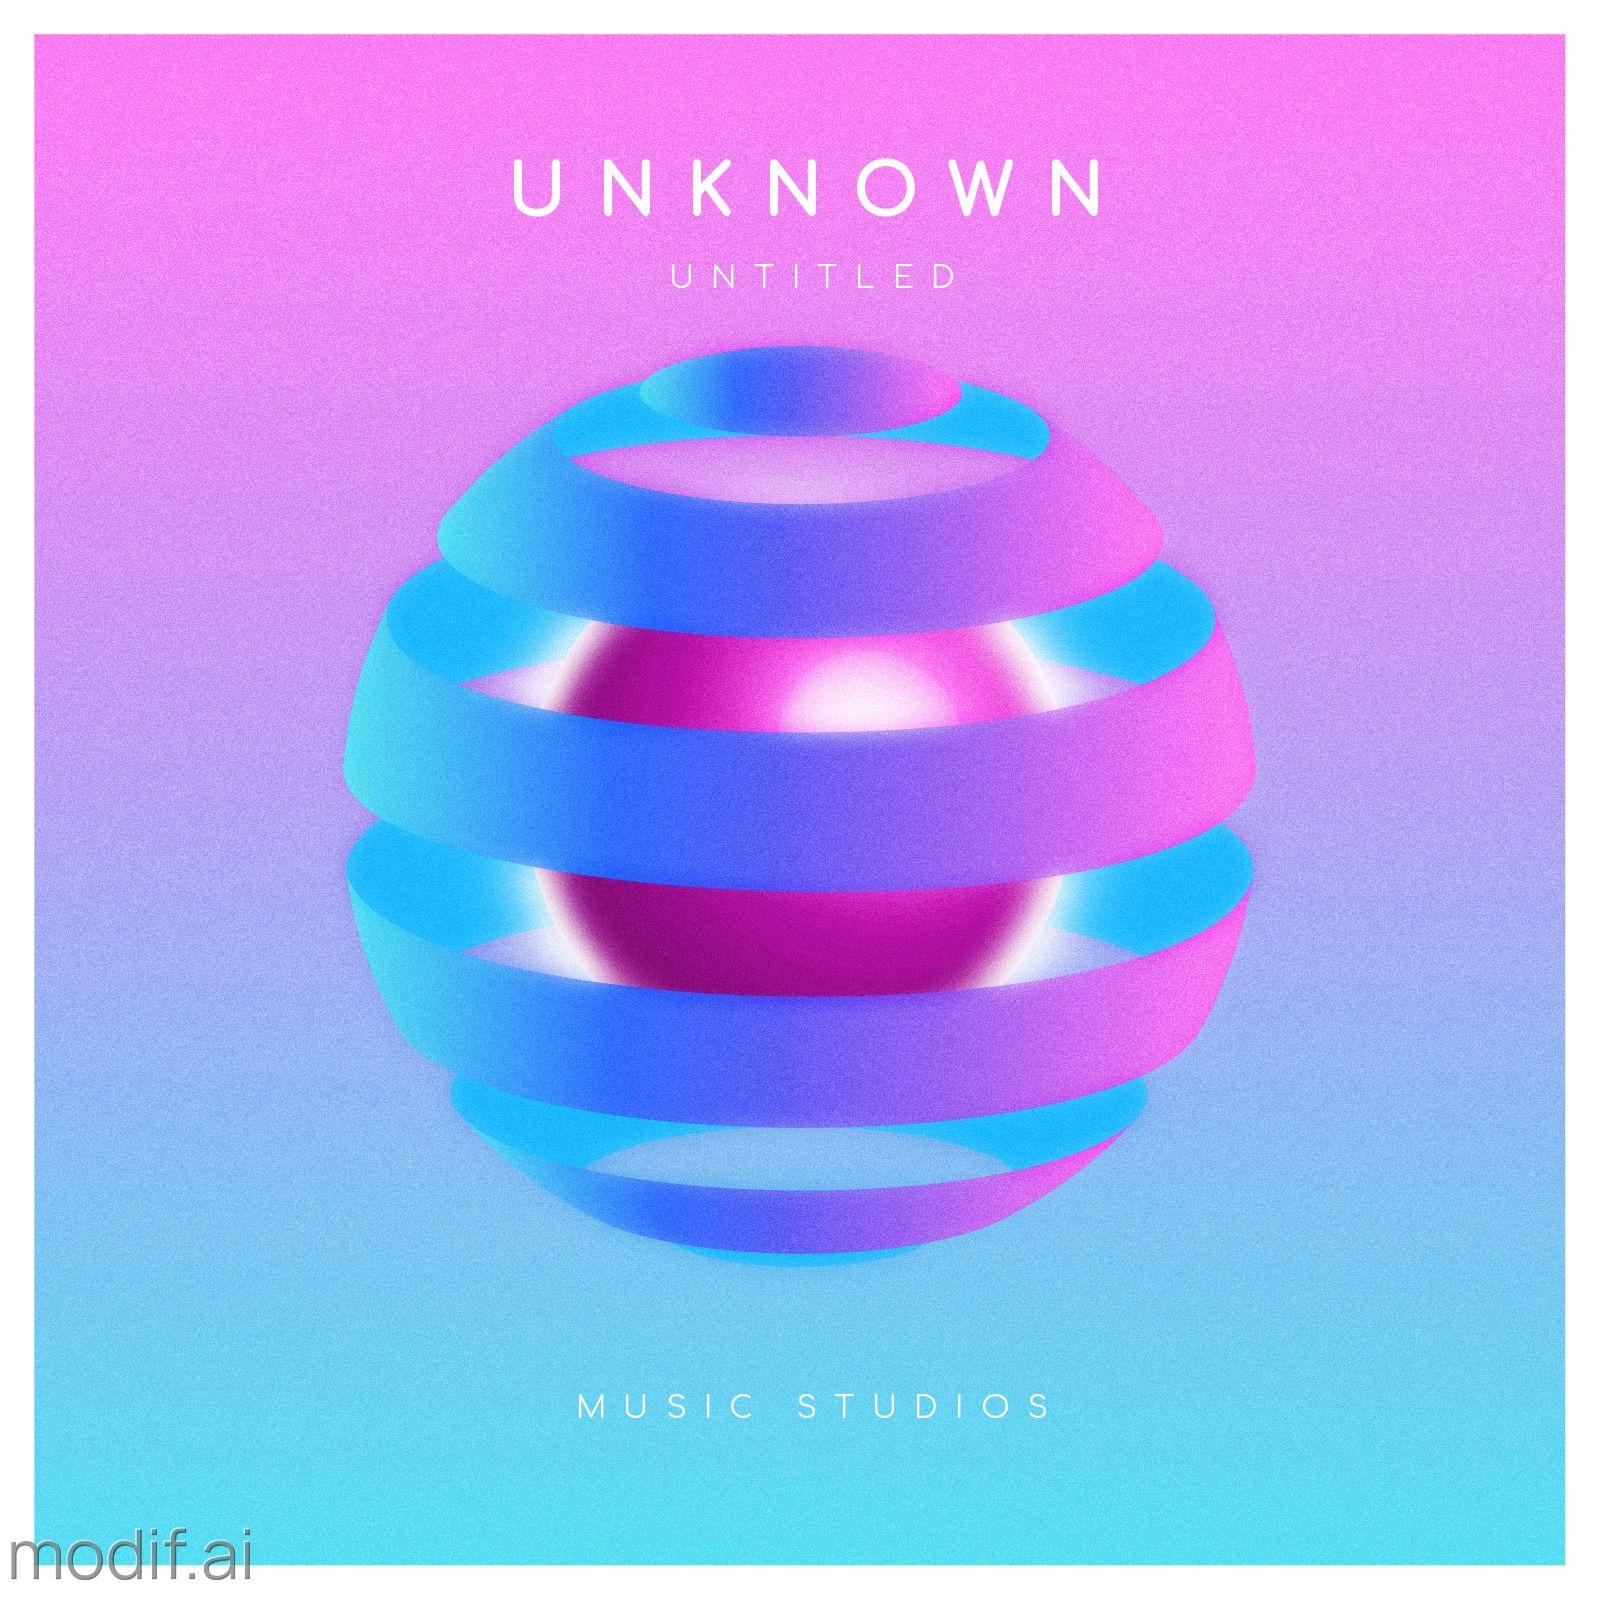 Futuristic Sphere Digital Album Cover Template